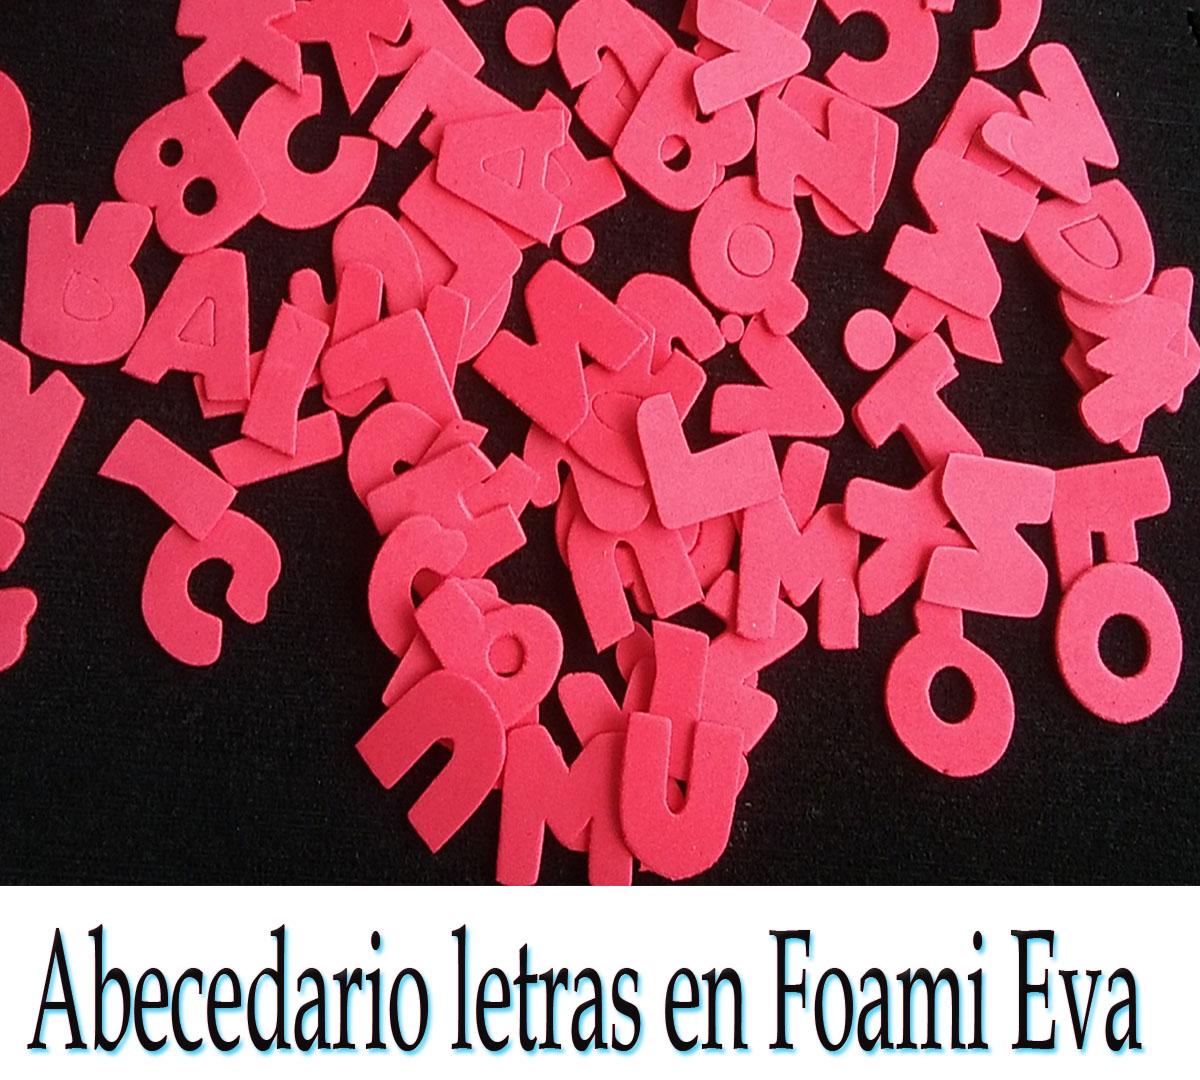 Letras abecedario letras en goma eva alfabeto fomy para manualidades